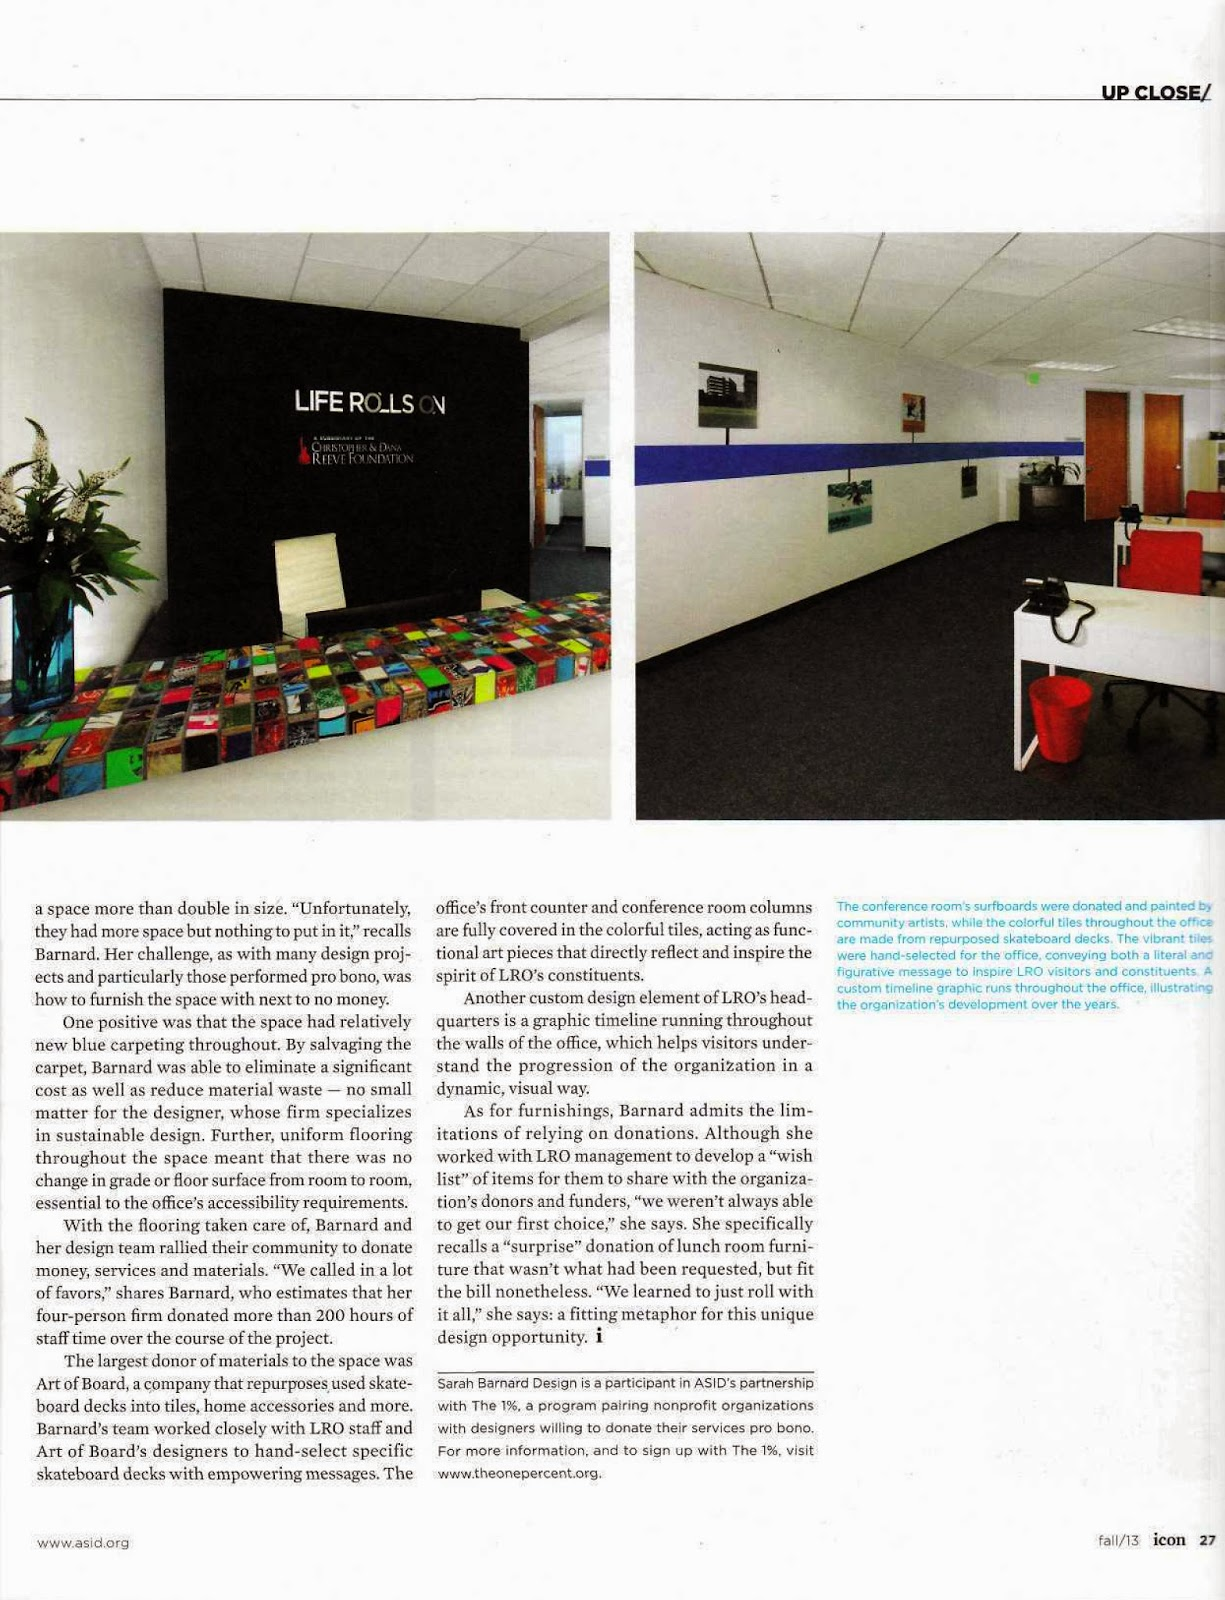 Commerical Office Interior Design Sarah Barnard Design Story